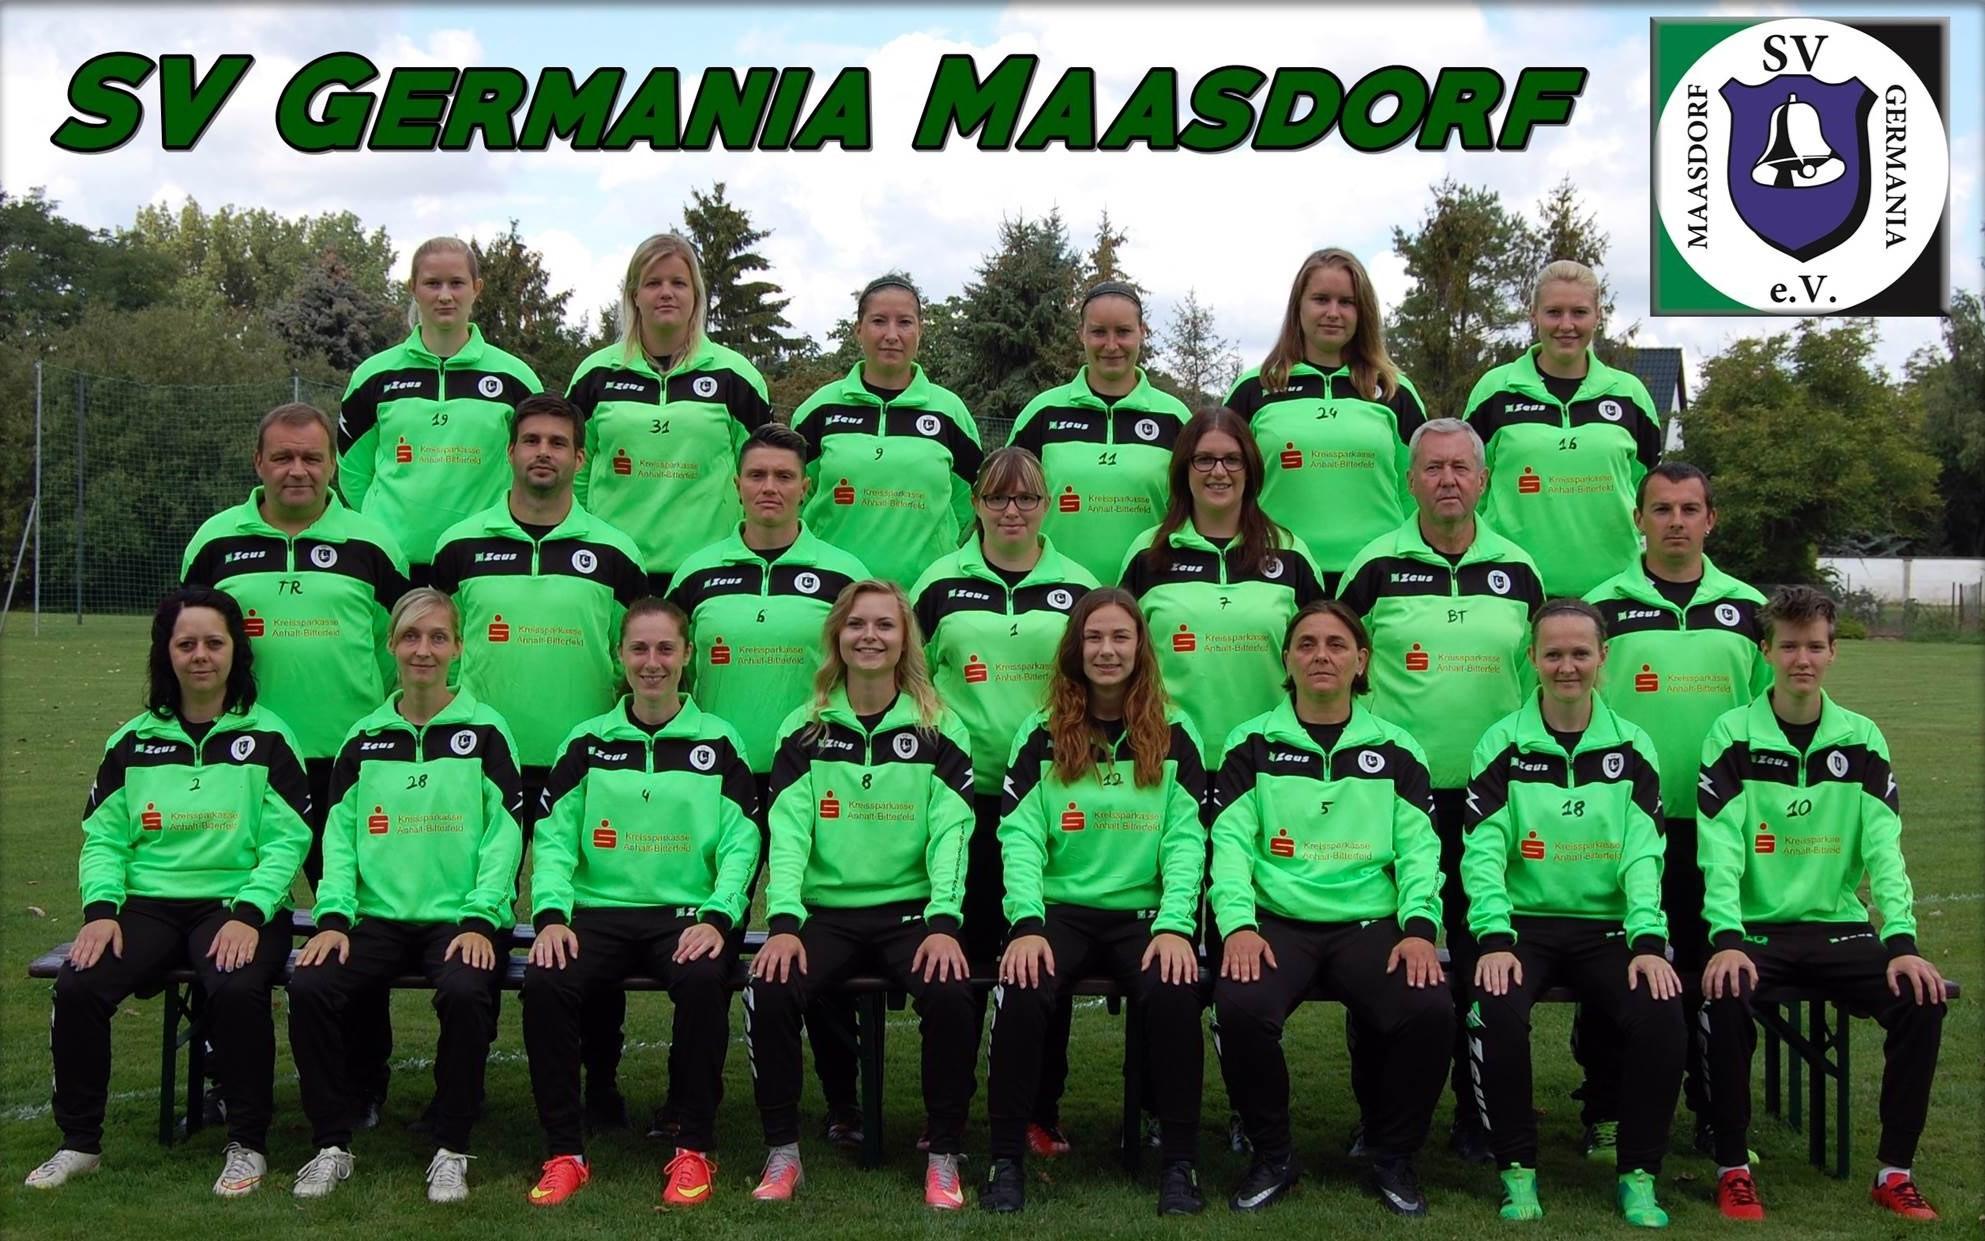 Mannschaftsfoto SV Germania Maasdorf